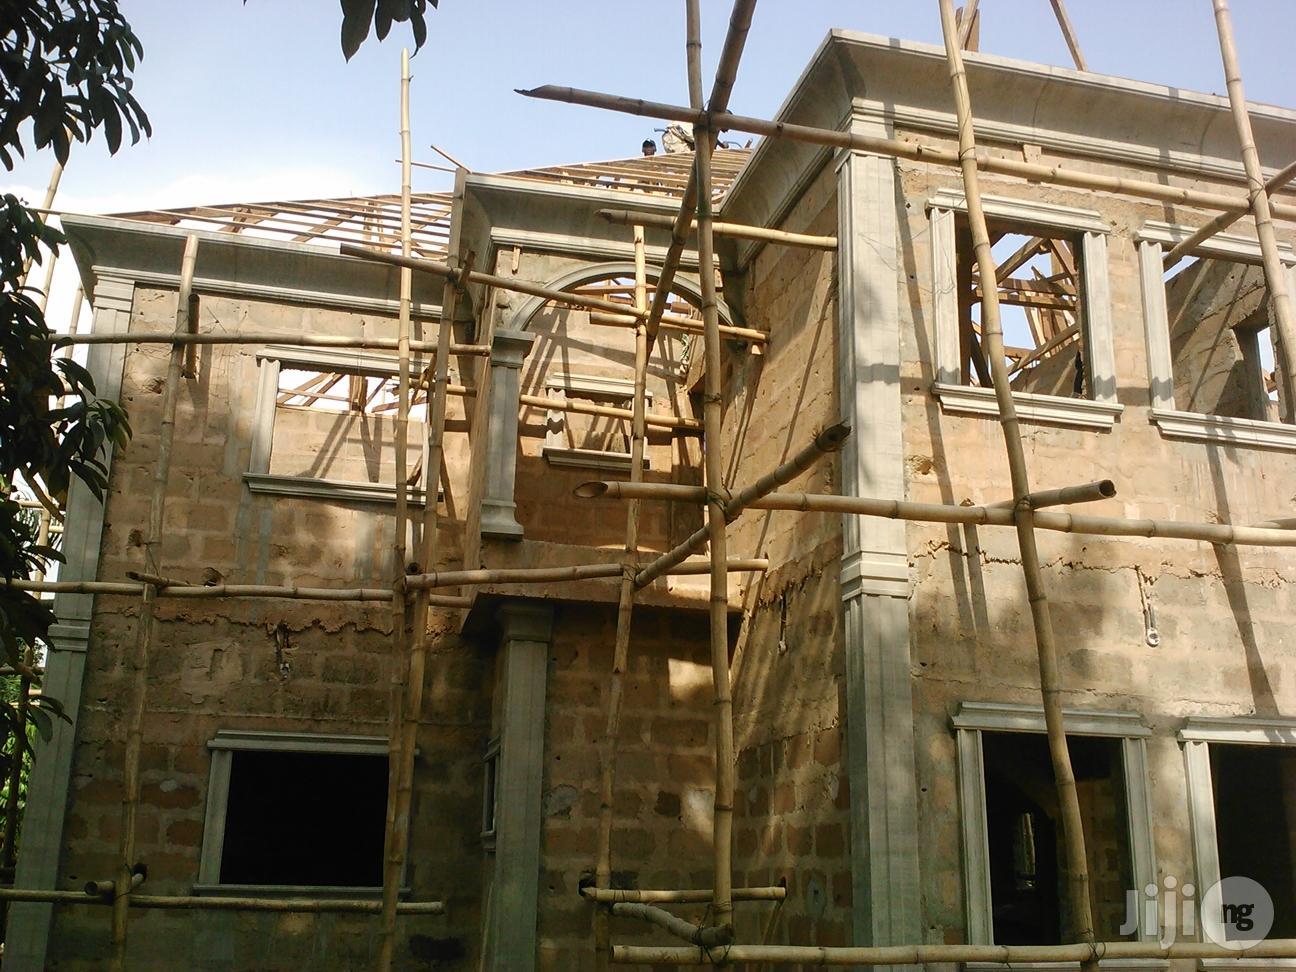 Archive Precast Parapet Concrete Fascia In Ajah Building Trades Services Cce Cmiony Craft And Engineering Jiji Ng In Ajah Building Trades Services From Cce Cmiony Craft And Engineering